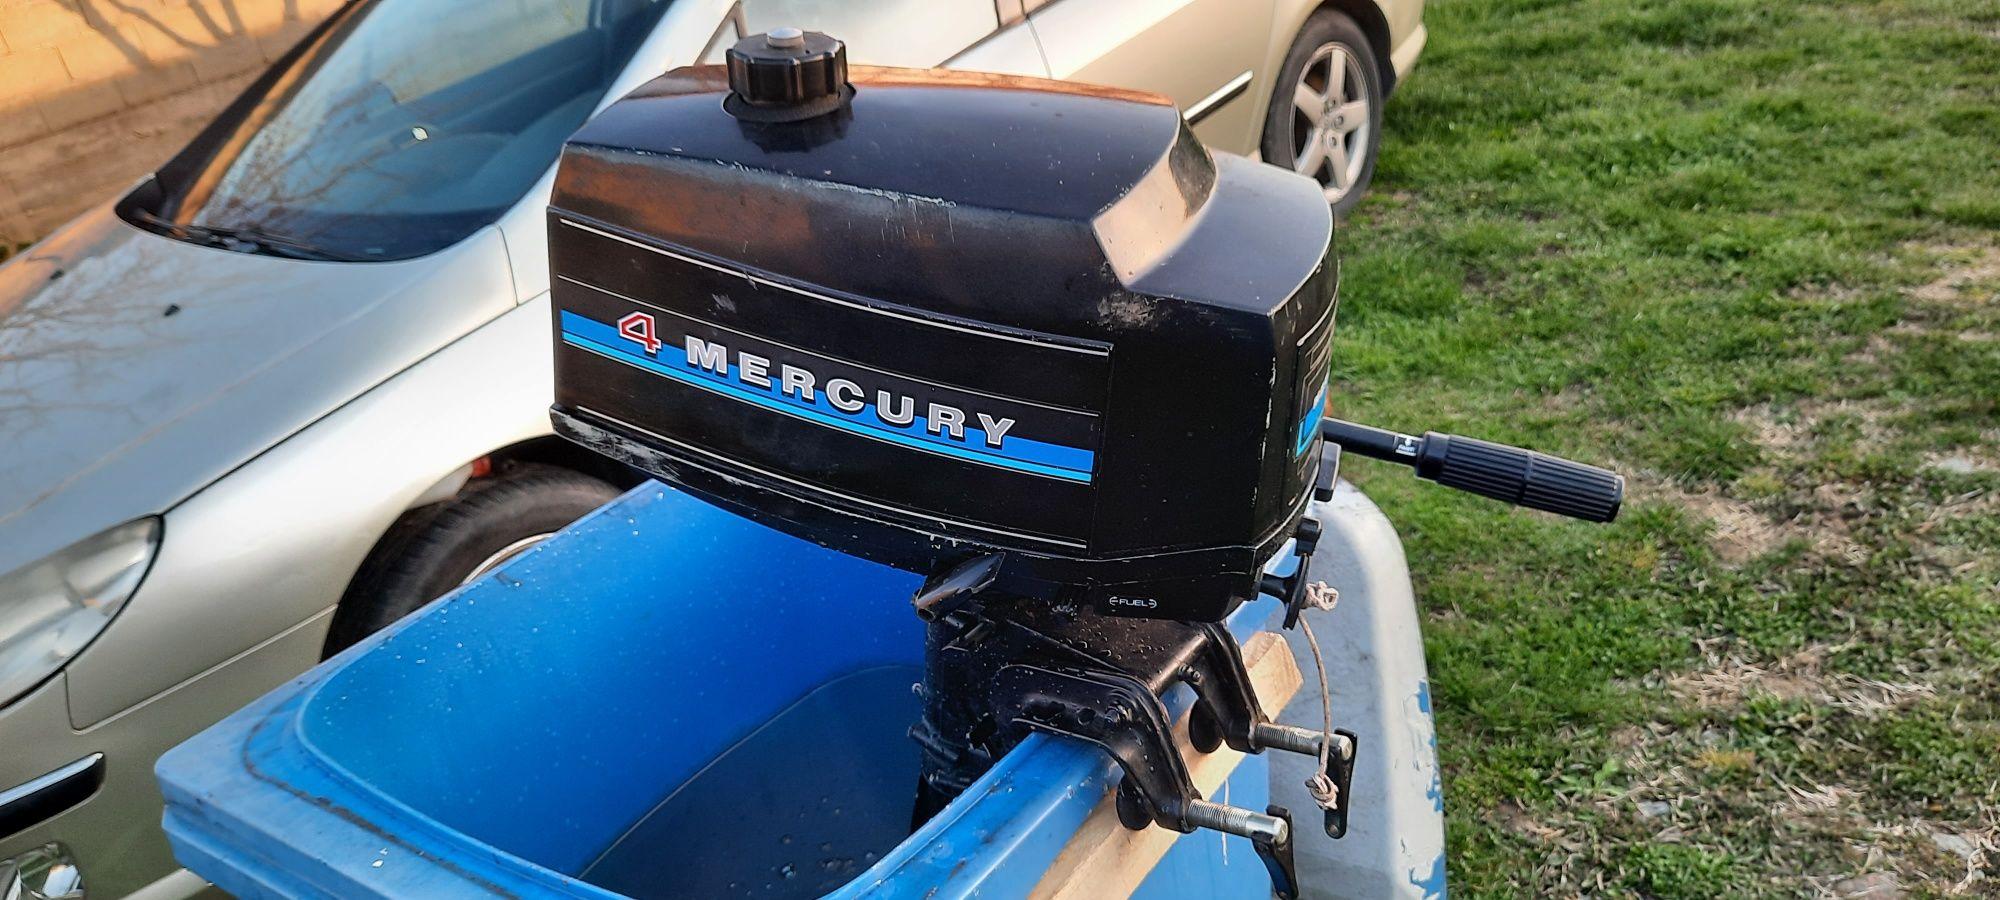 Motor Mercury 4 cp 2 T